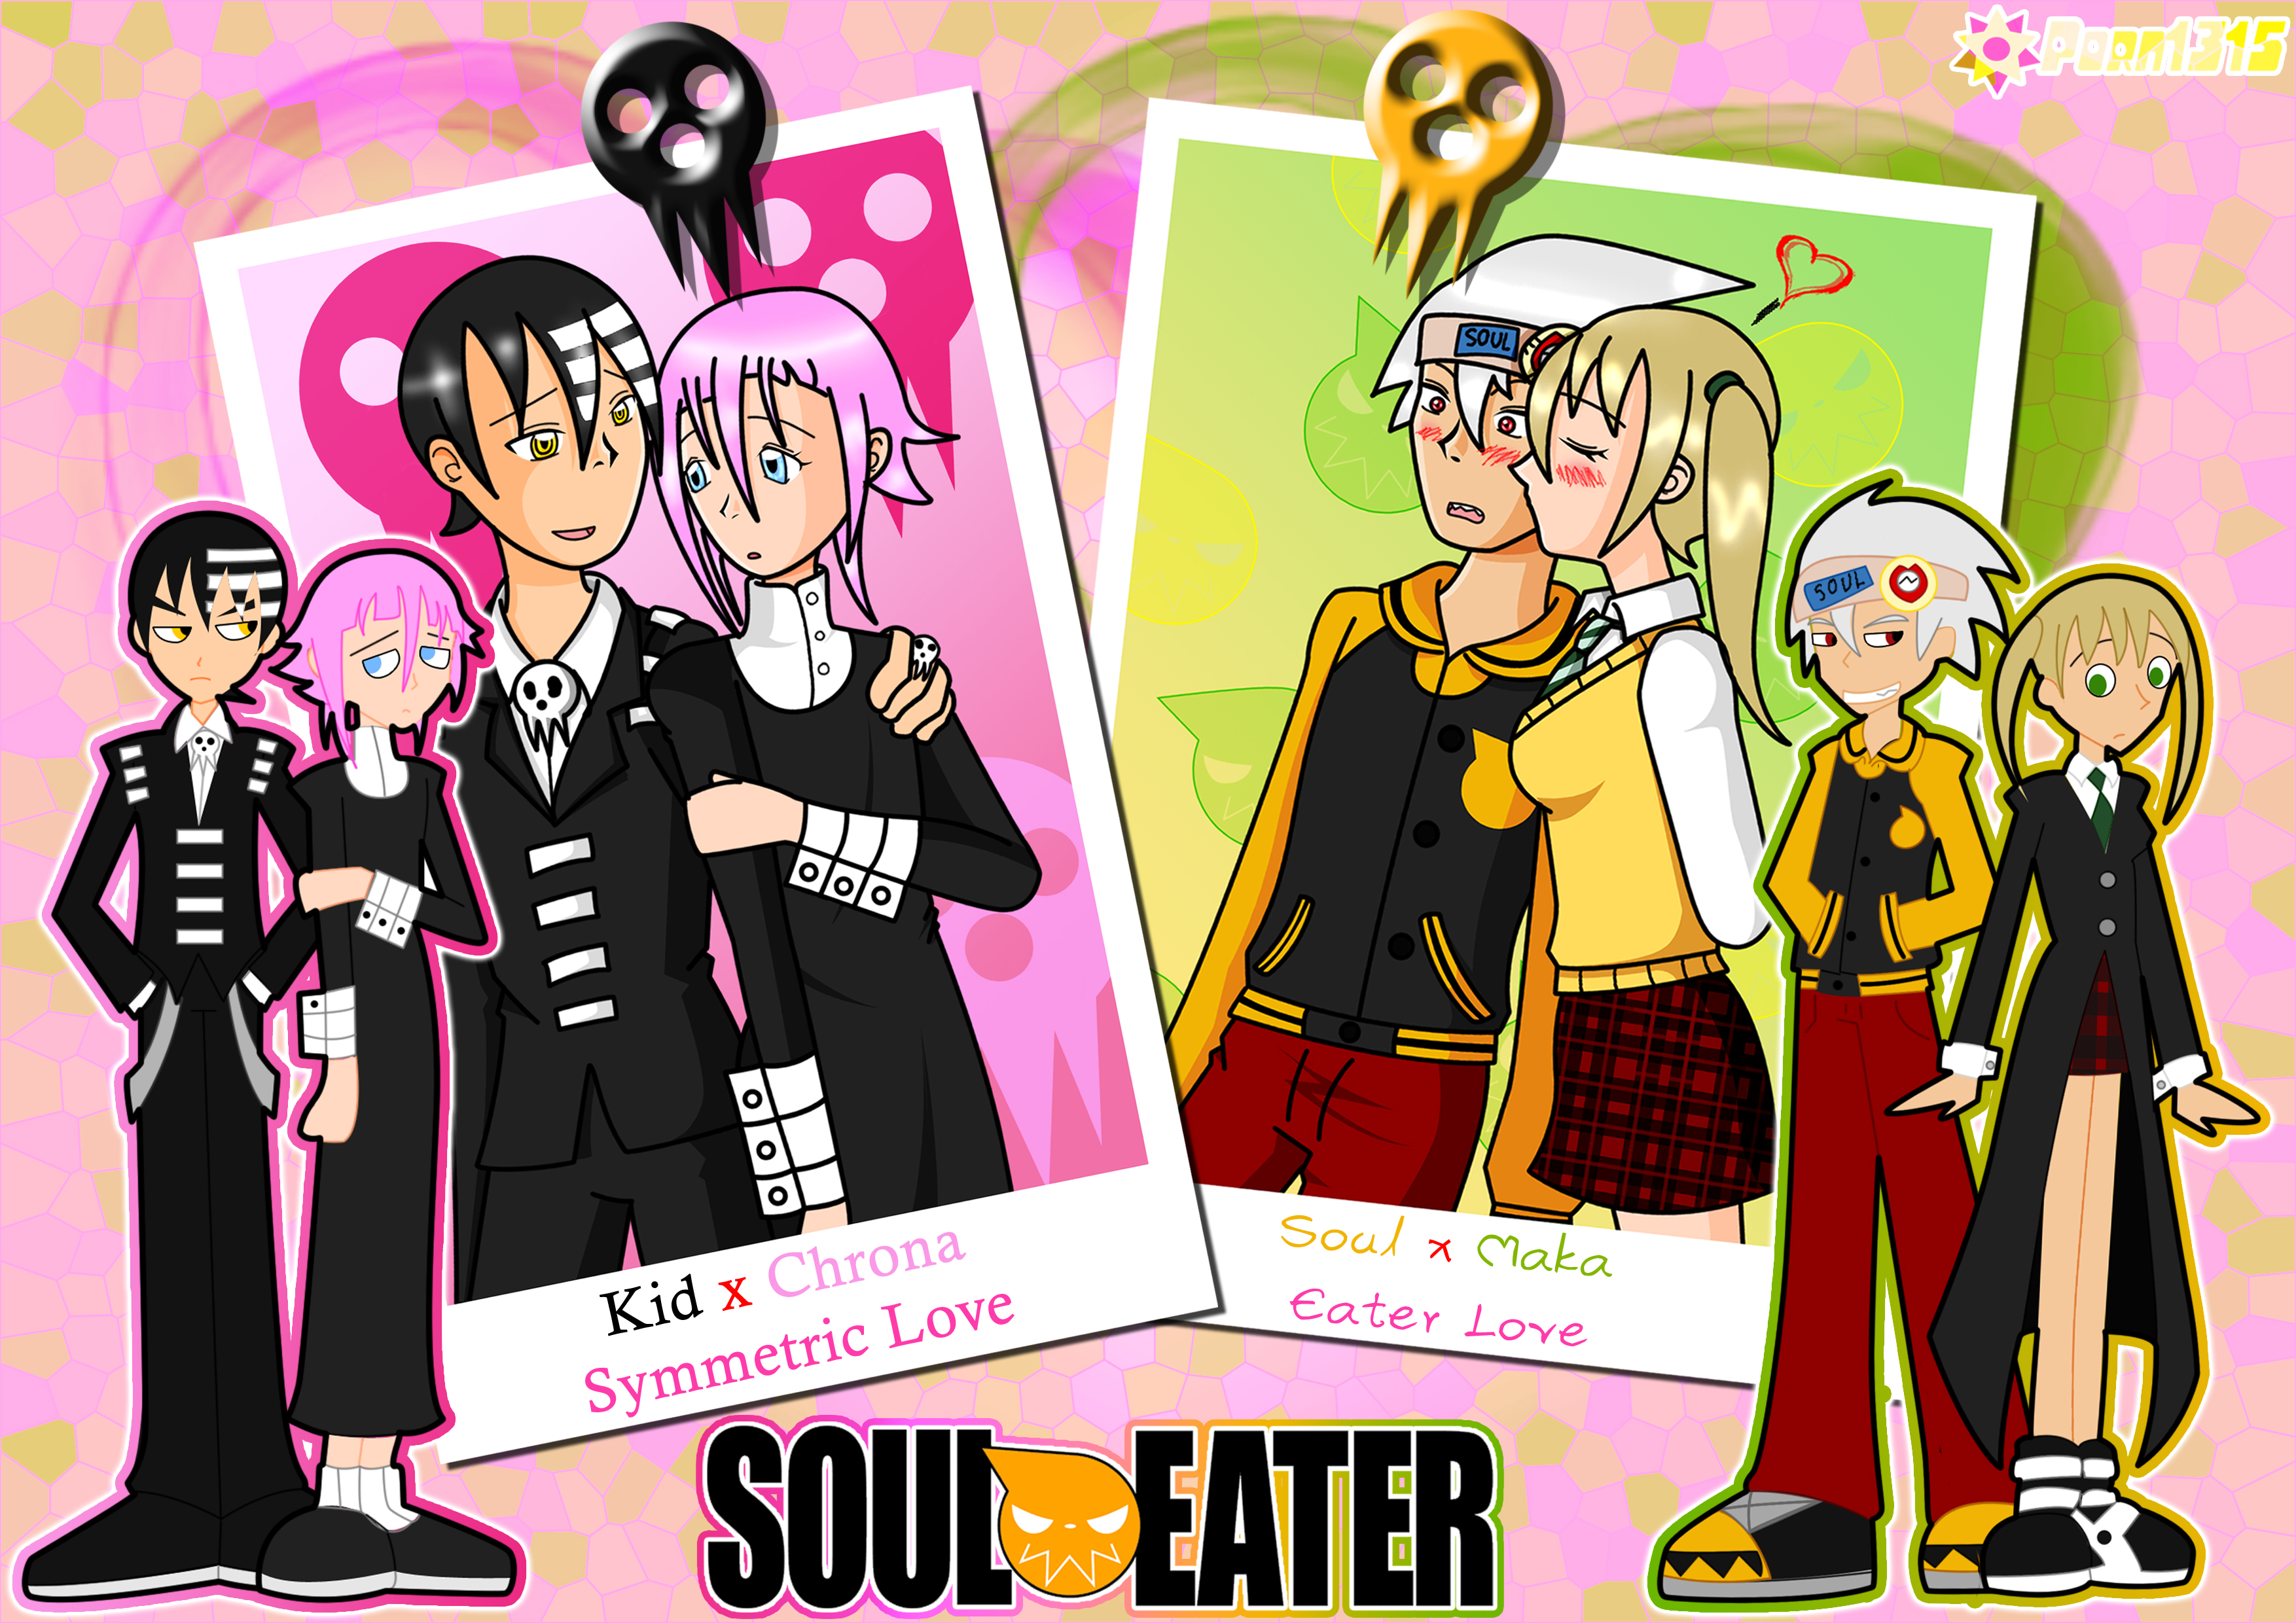 http://fc00.deviantart.net/fs41/f/2009/049/c/7/SE_KidChrona_x_SoulMaka_by_Porn1315.jpg